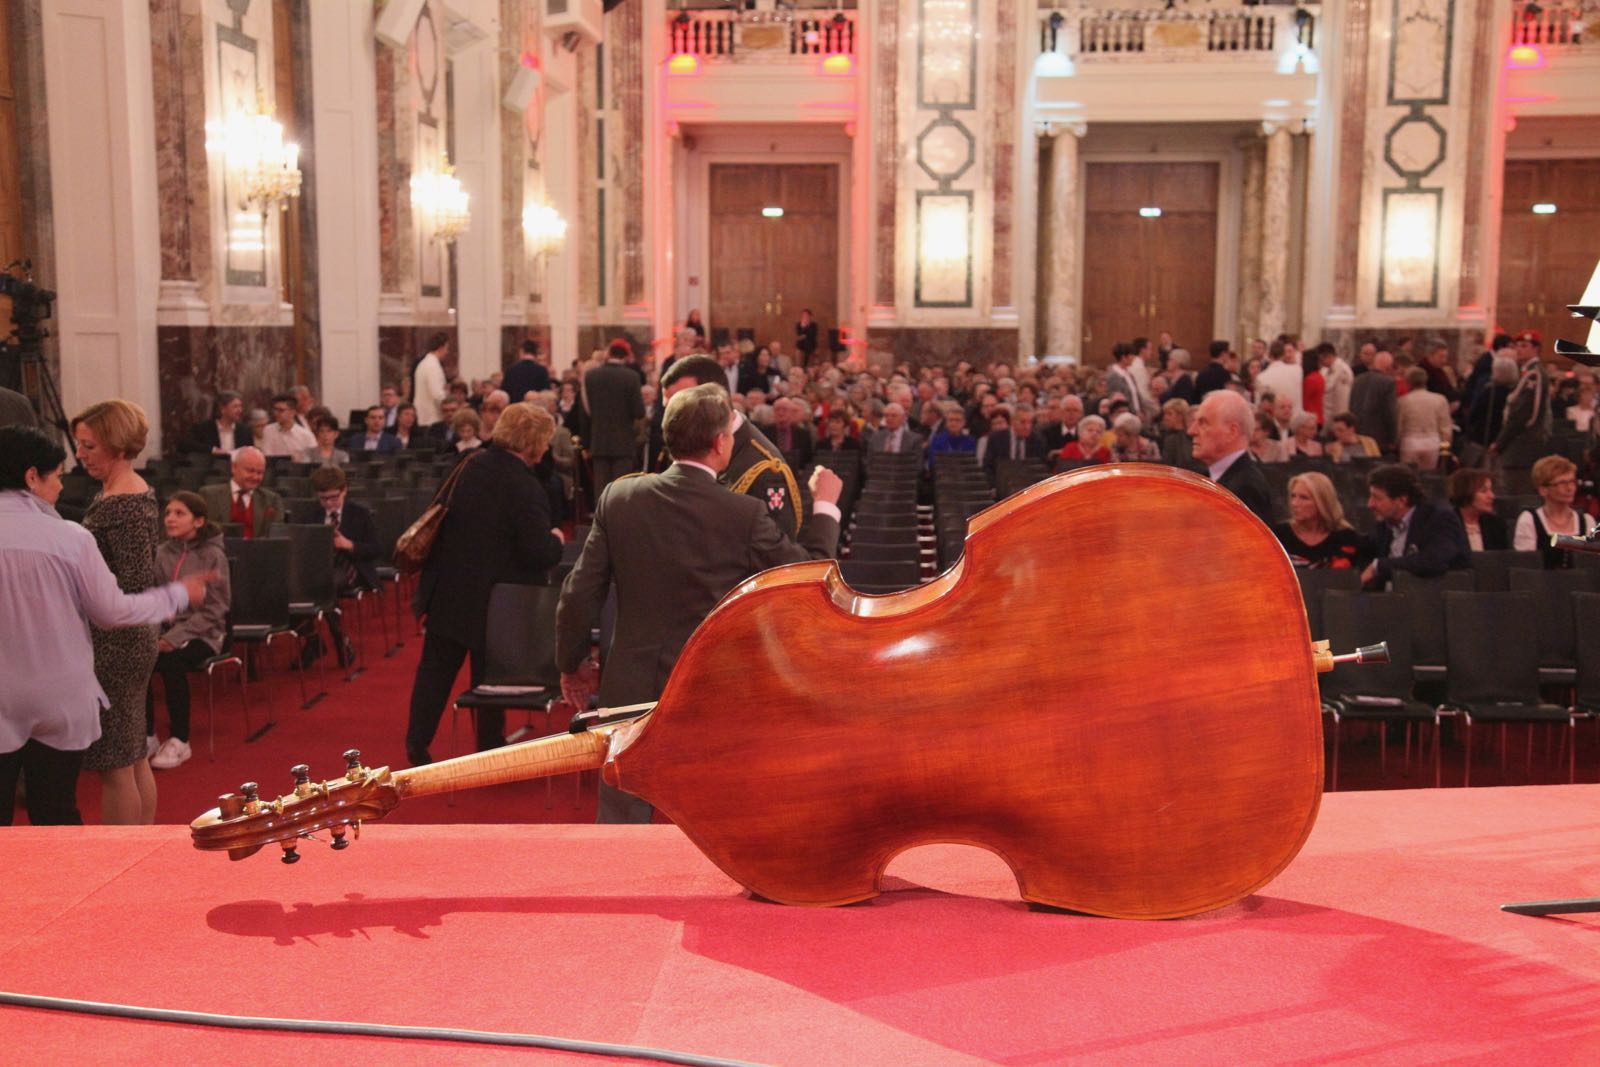 2019_03_14Gardemusik_Frühjahrskonzert_HBP_Hofburg - 27 of 177